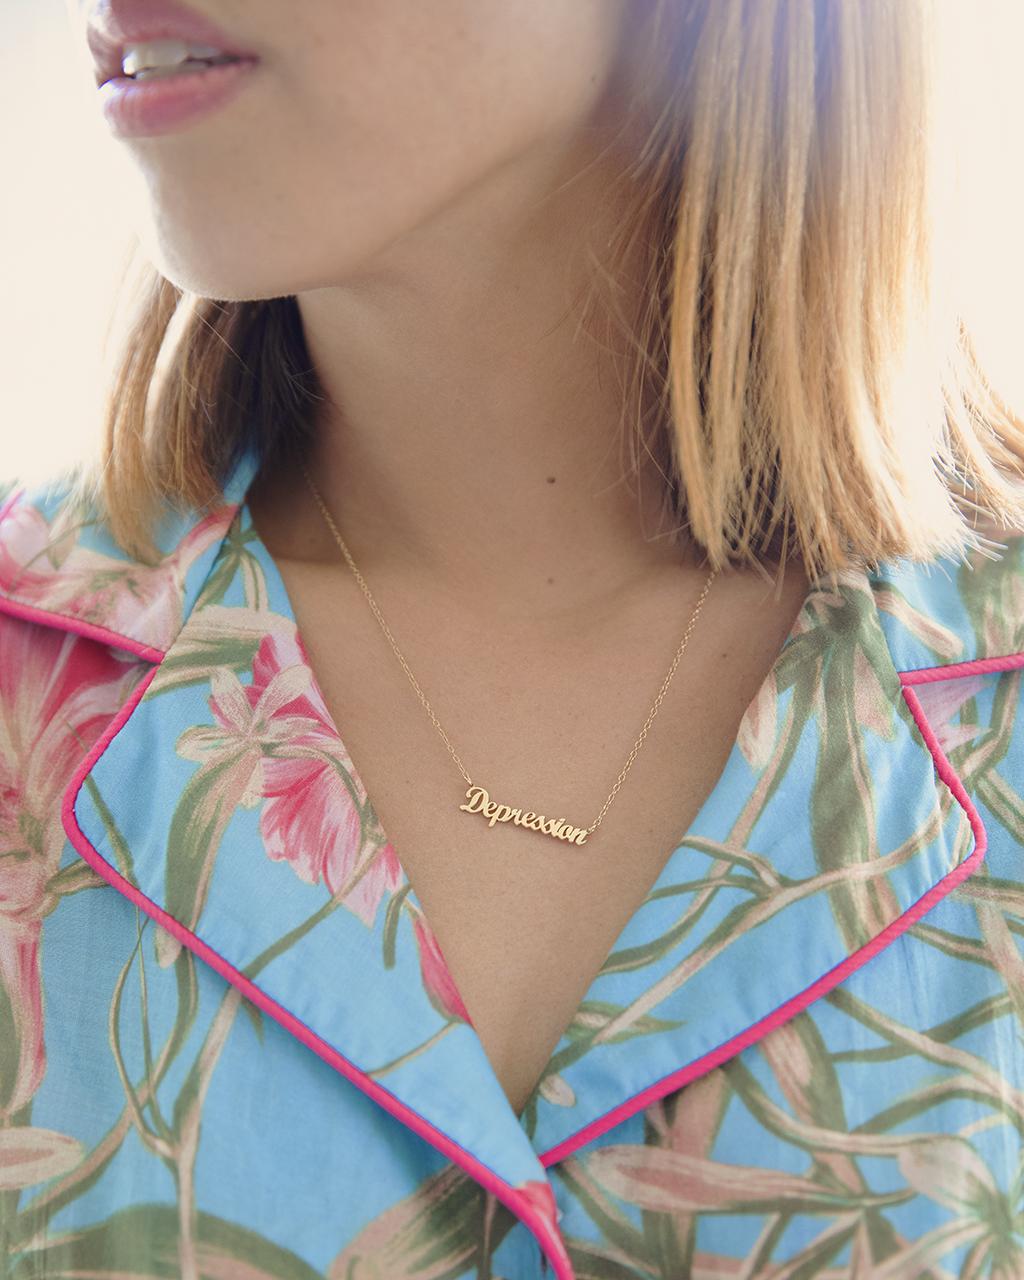 bando-depression-mental-illness-necklace.jpg